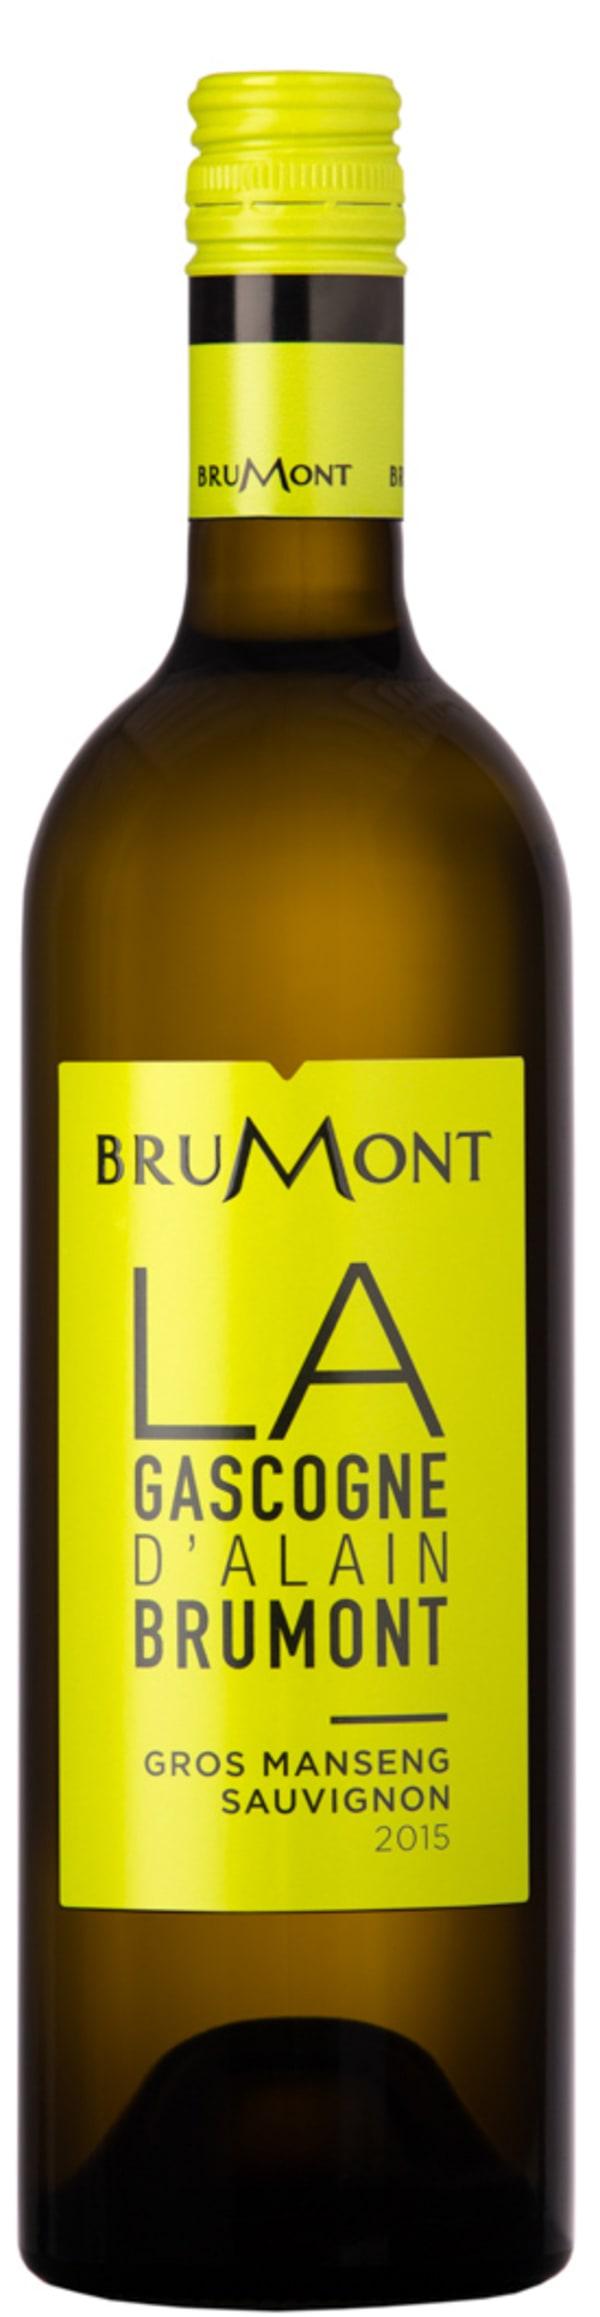 Brumont La Gascogne 2018